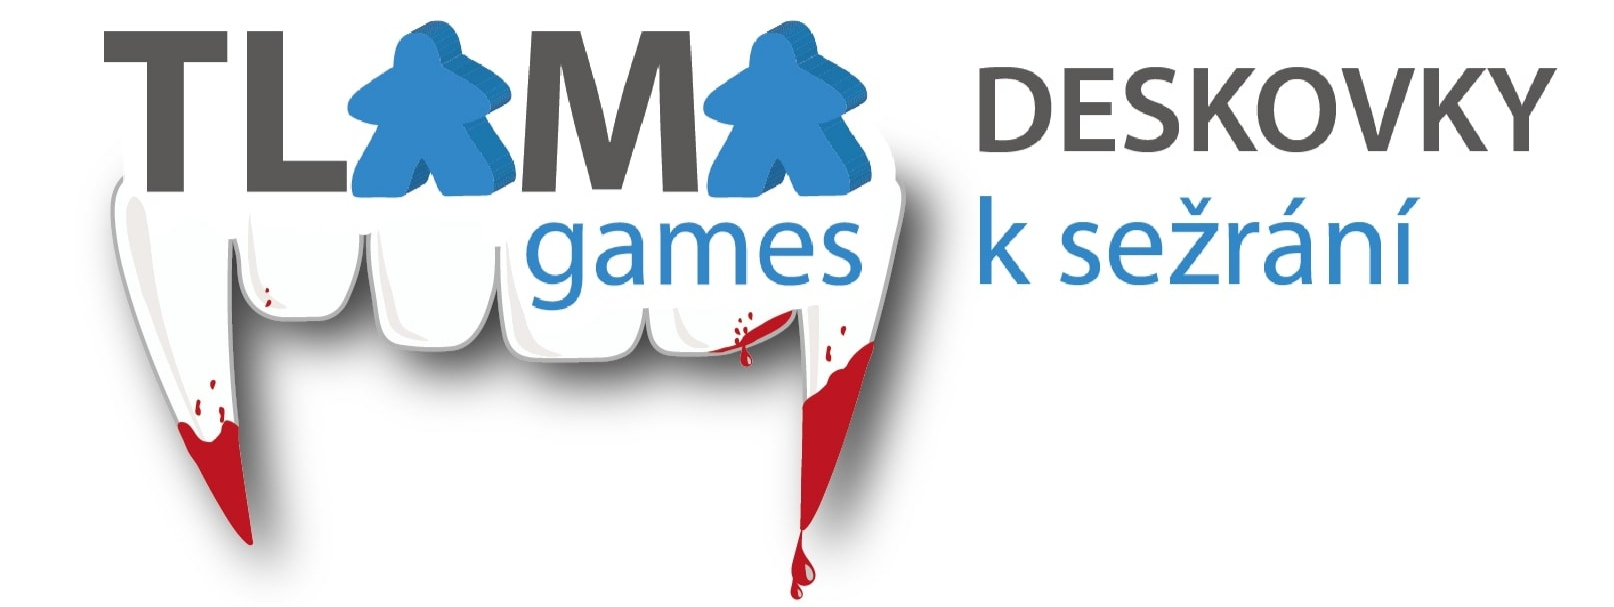 TLAMA games